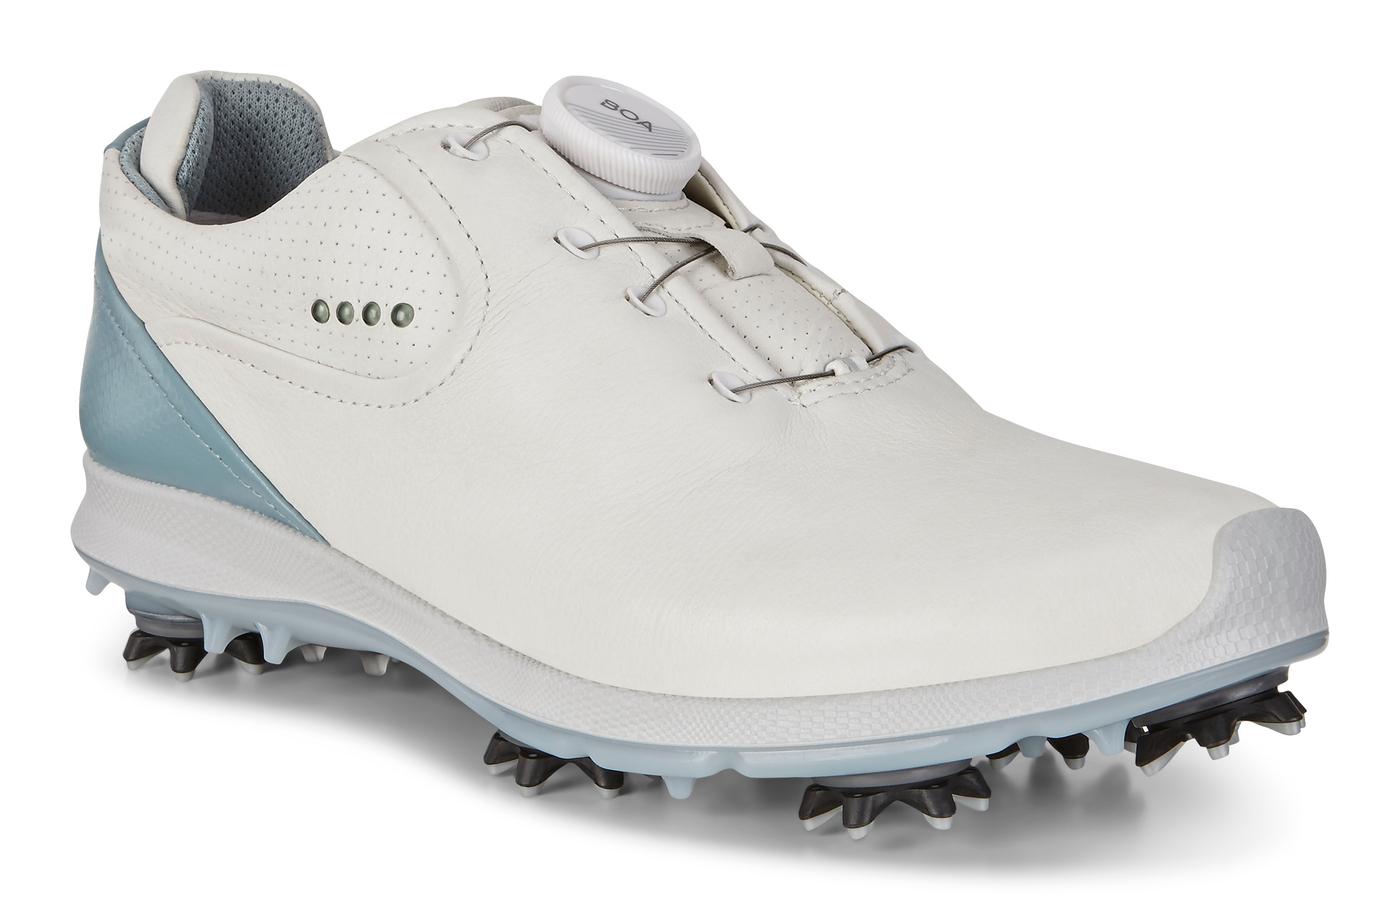 ECCO 여성 골프화 바이옴 G2 고어텍스